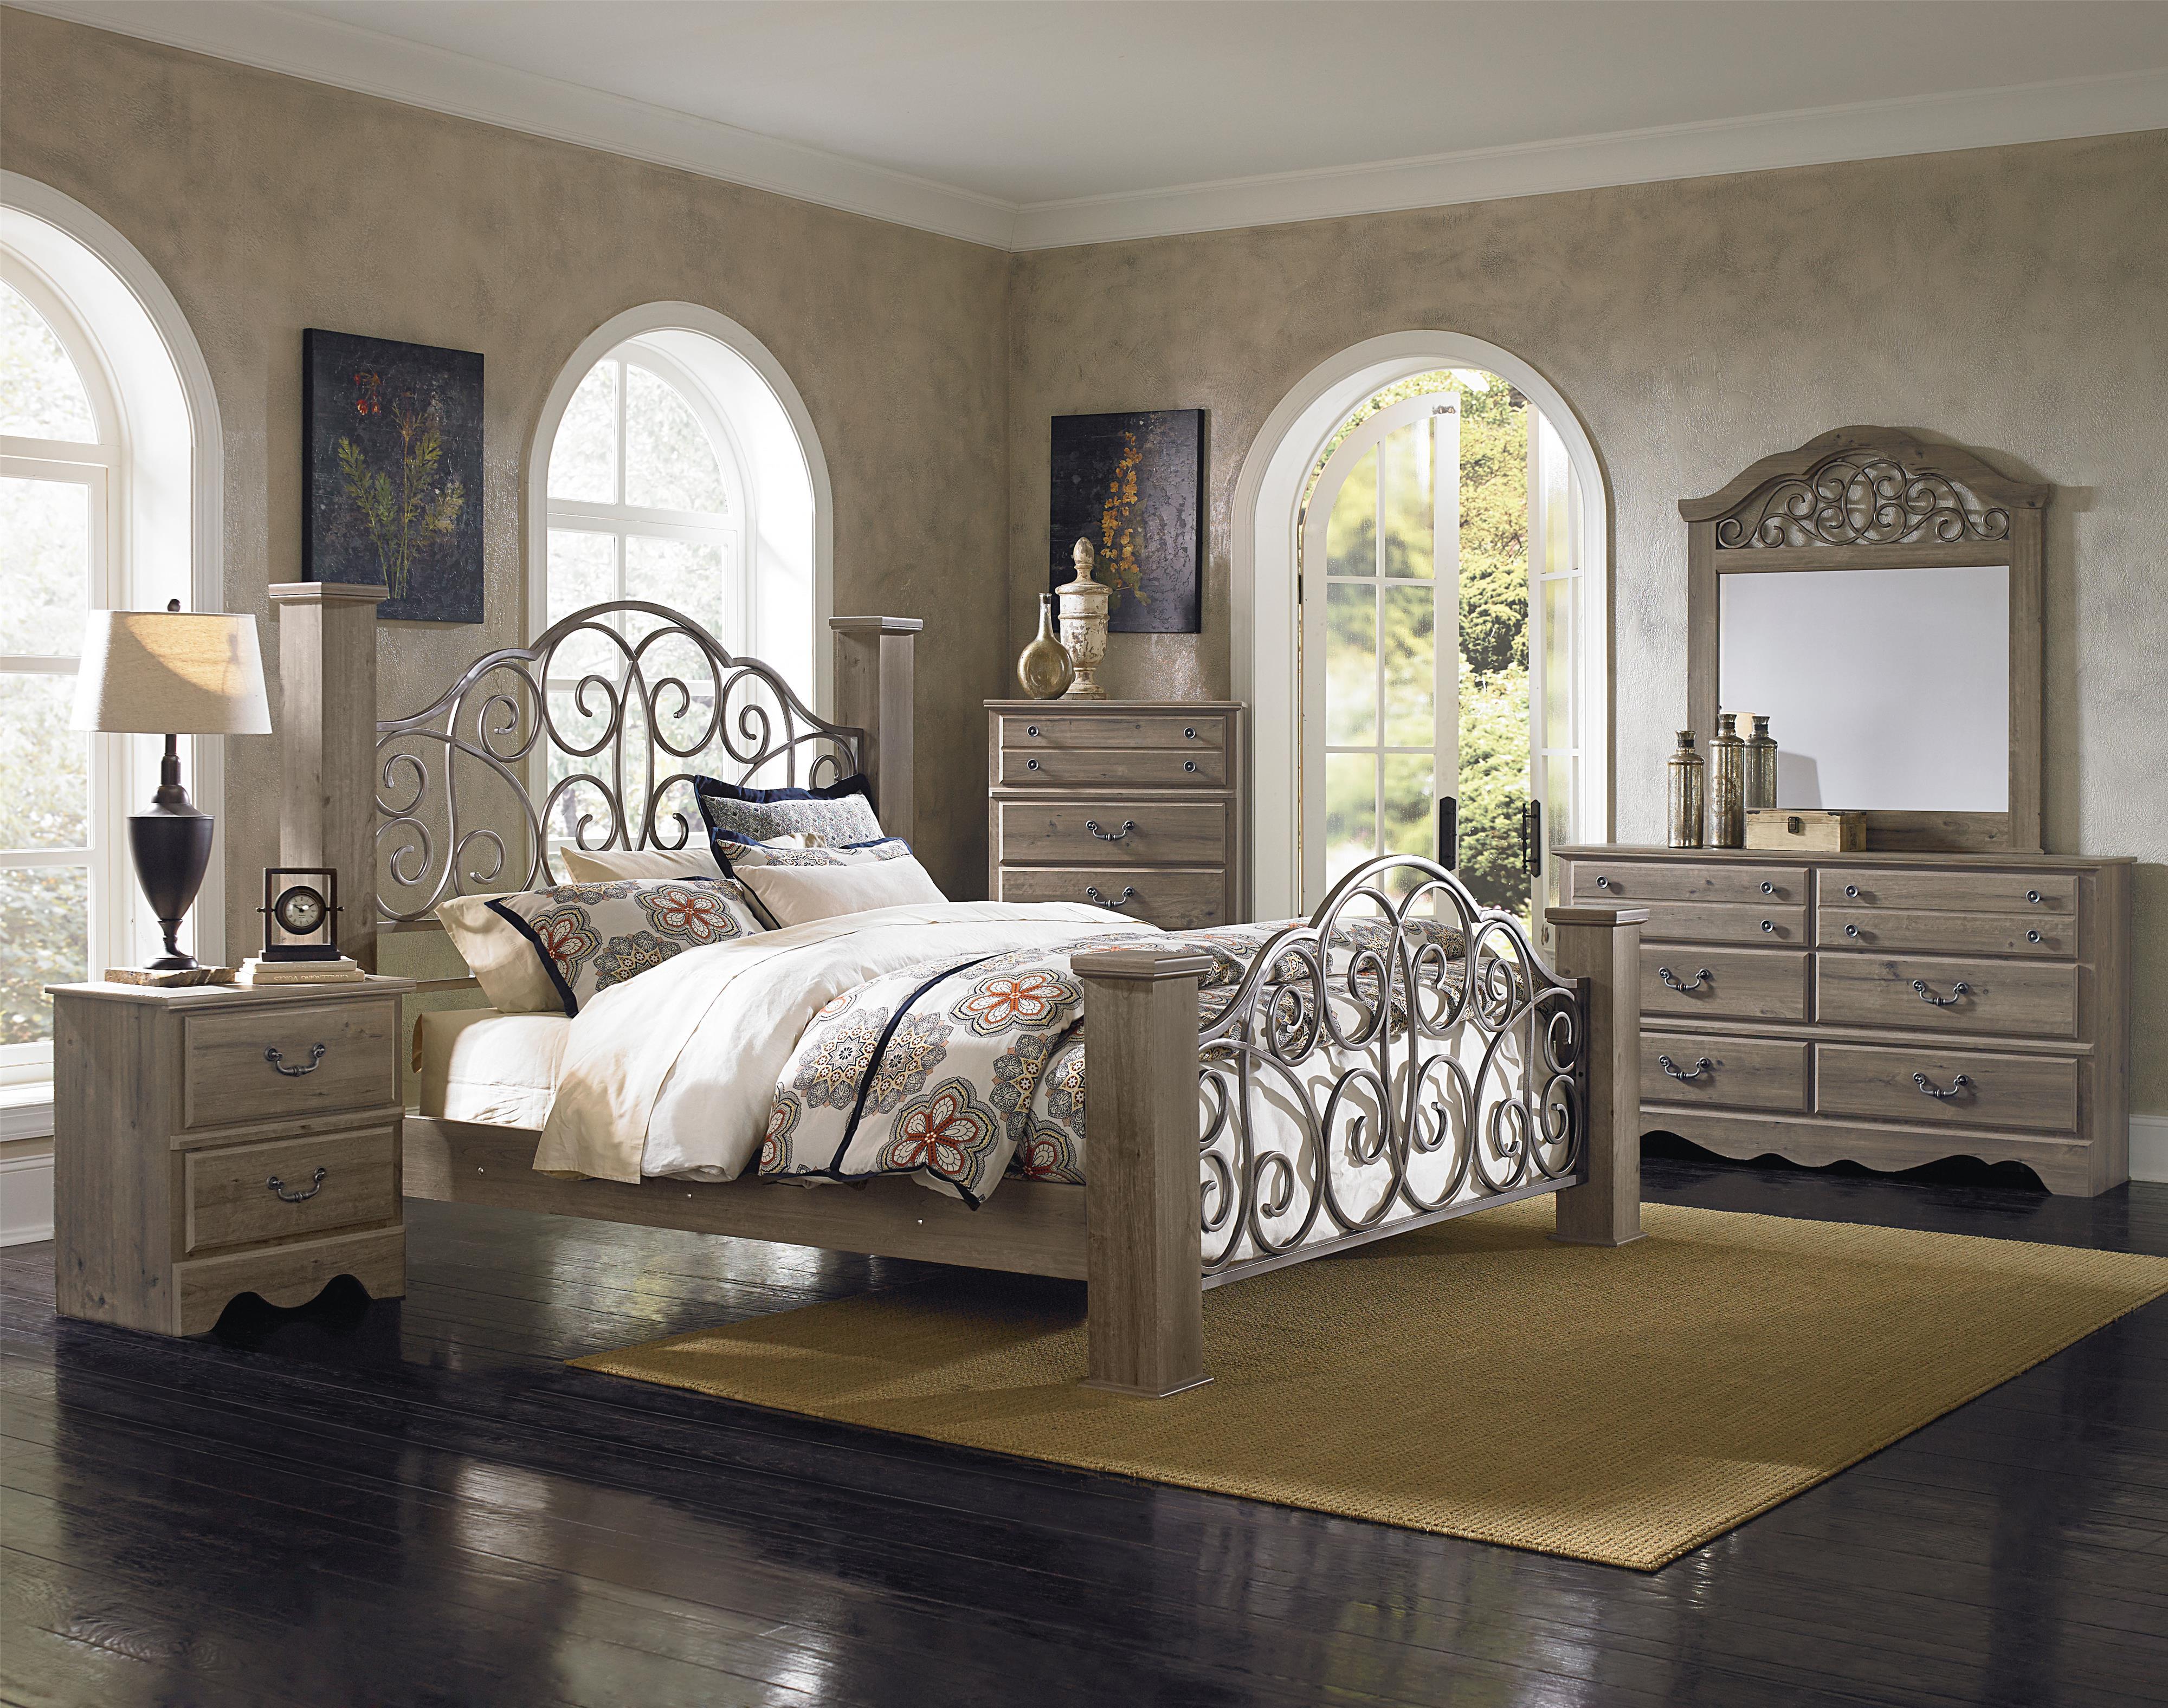 Standard Furniture Timber Creek Queen Bedroom Group Item Number 52650 Q 1